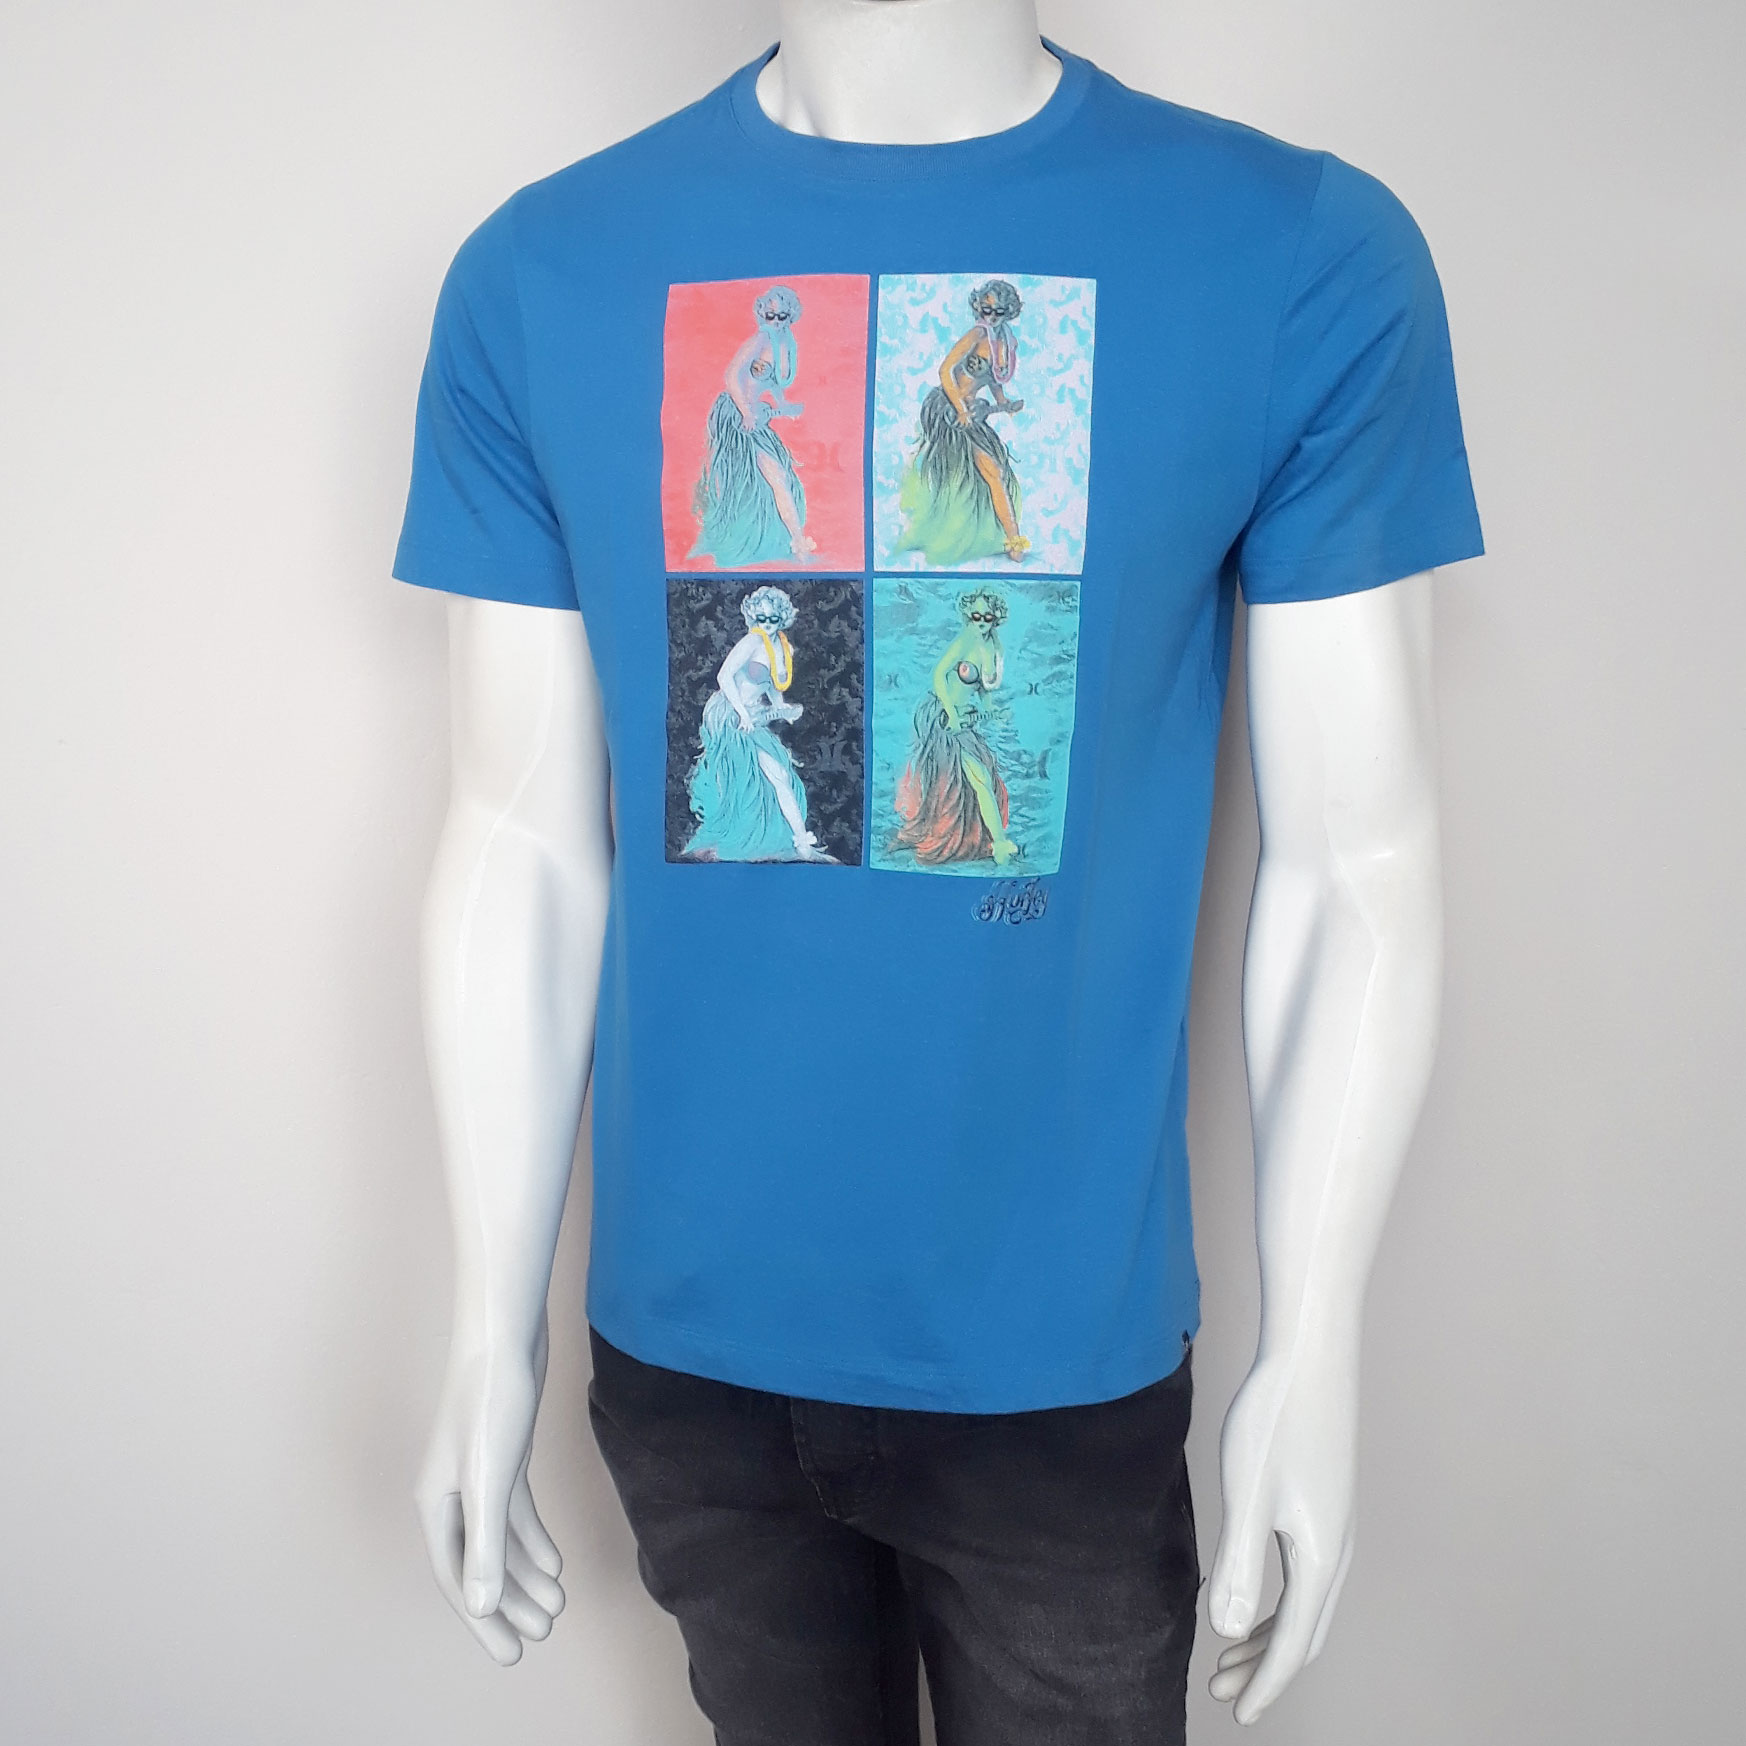 Camiseta Hurley Silk Hula 629025 Azul - P